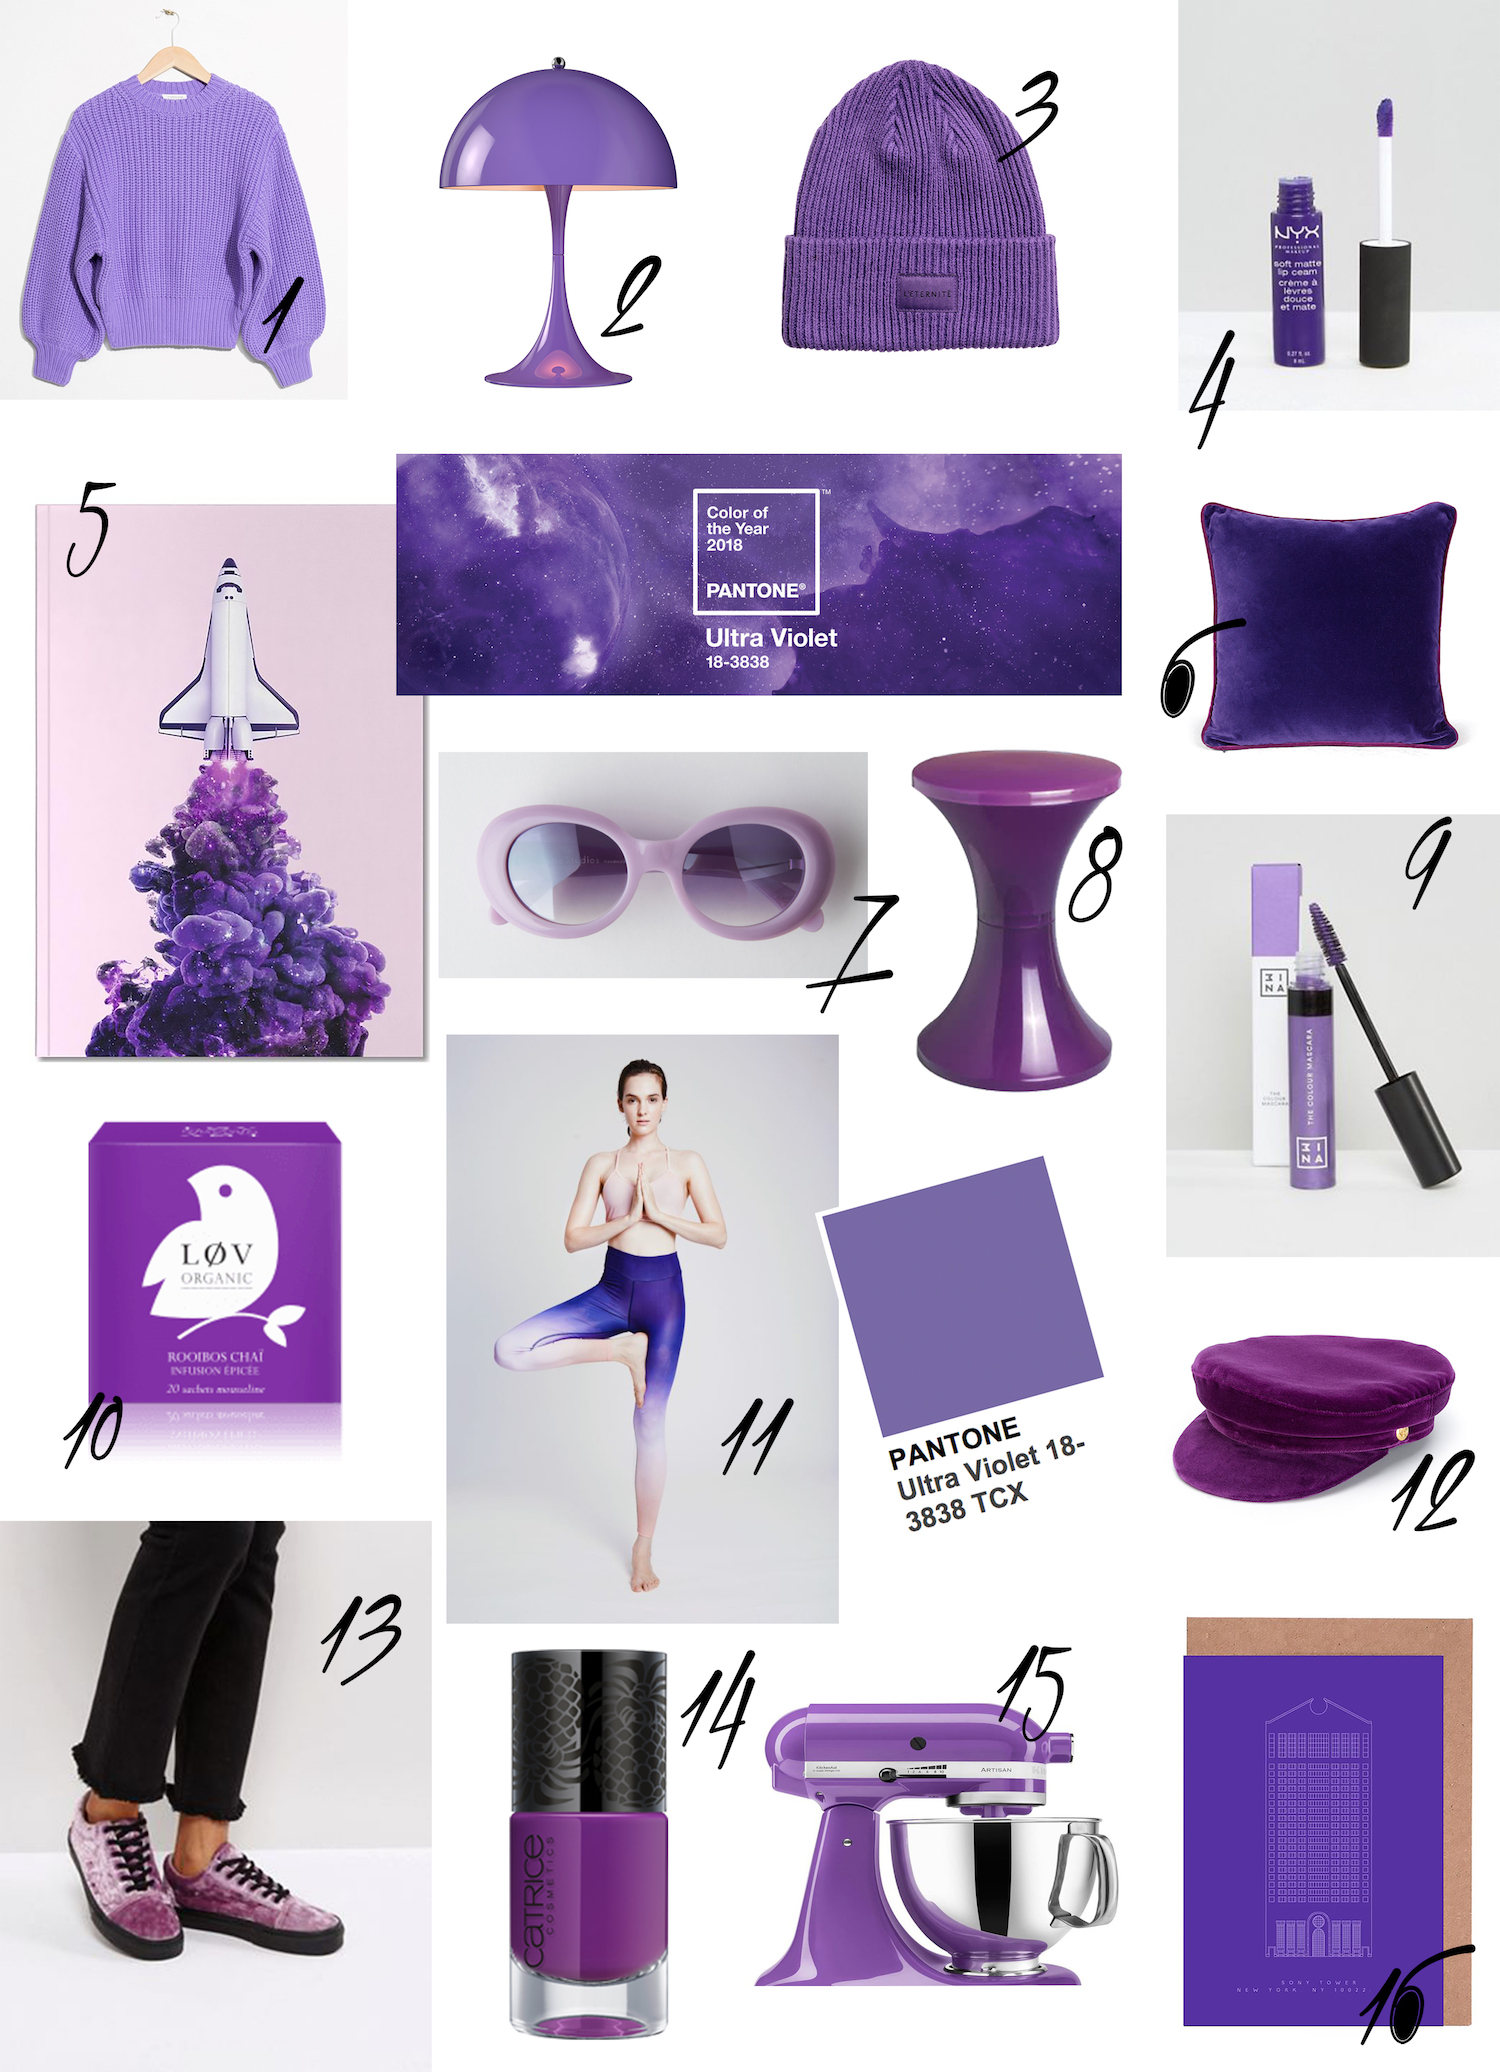 pantone-ultra-violet-trend